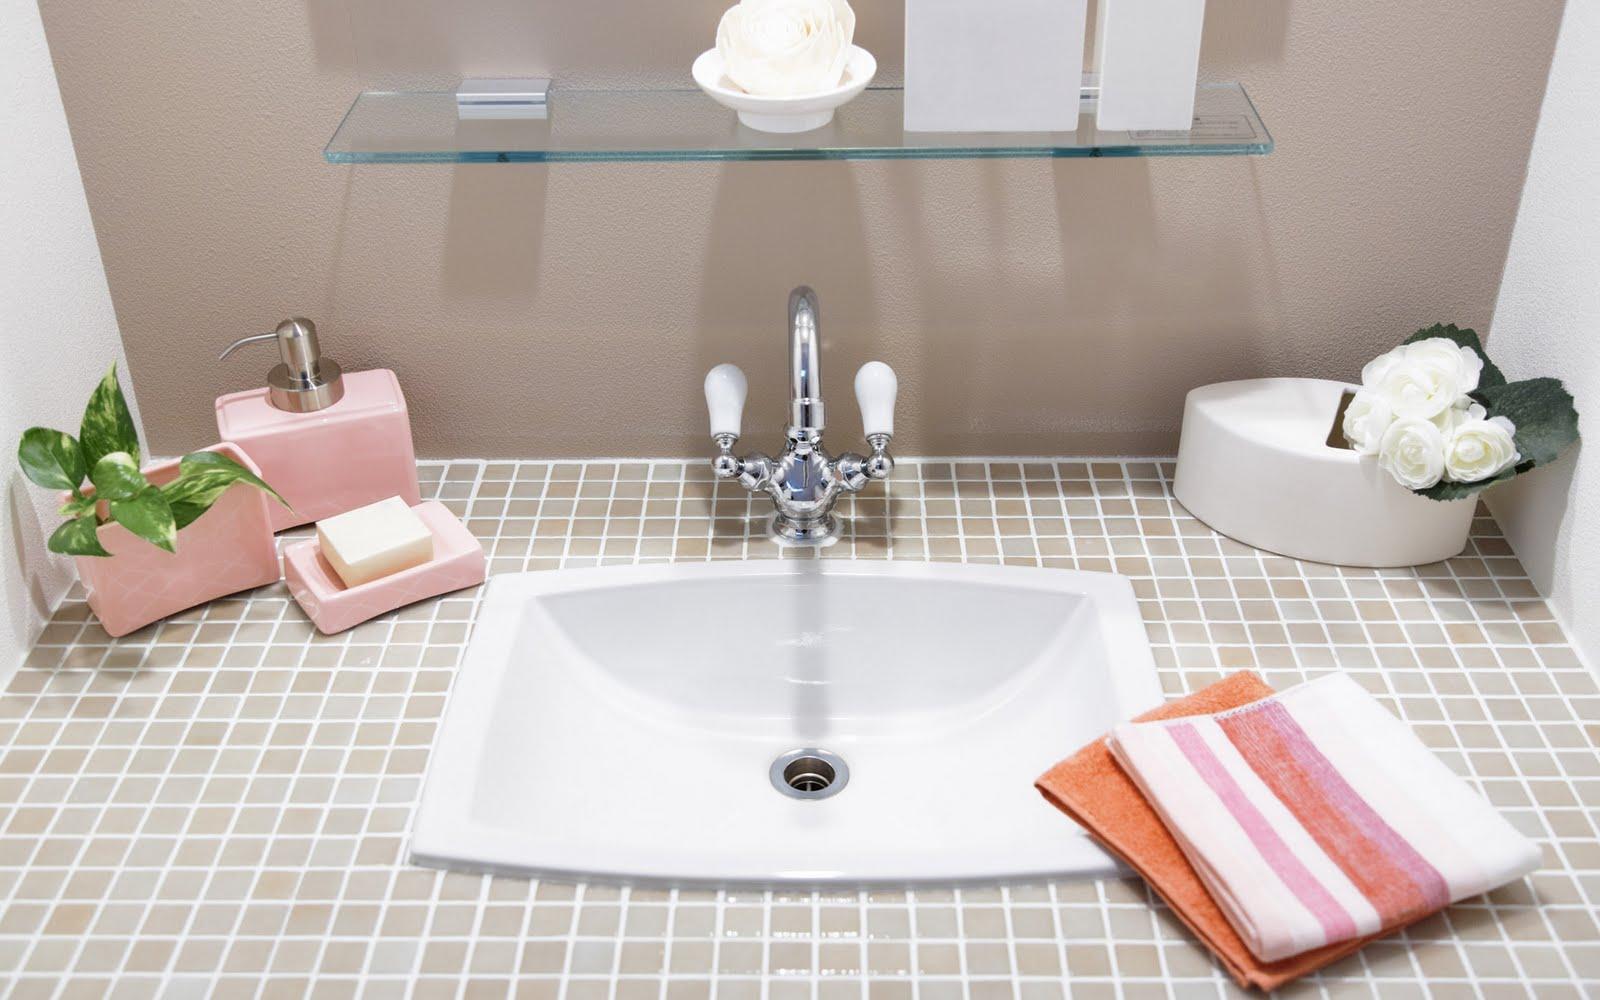 Dise o de interiores i 20 ideas para decorar tu hogar for Diseno de interiores sims 4